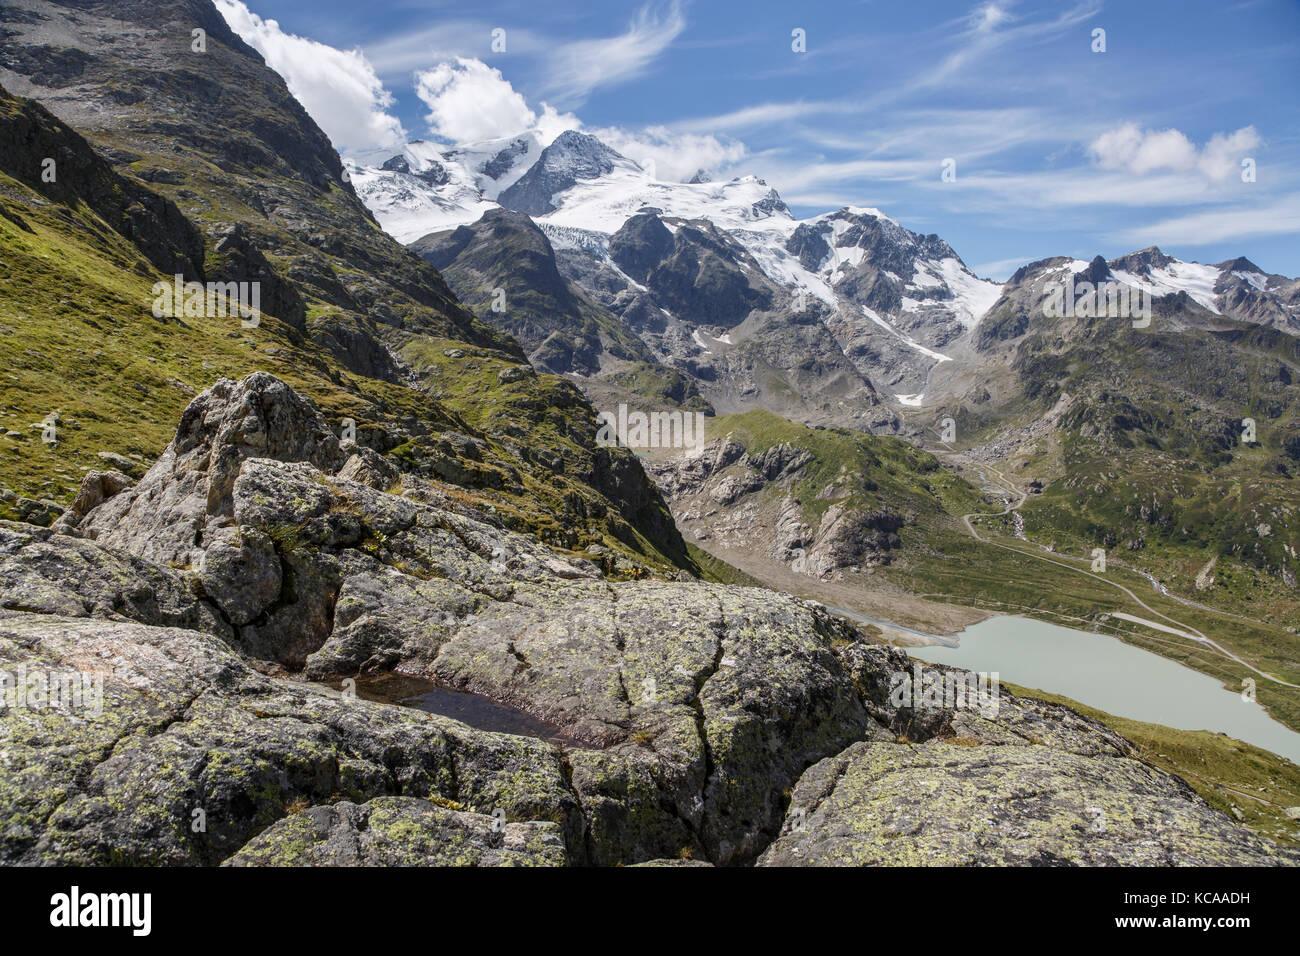 View from the Susten Pass to Sustenhorn and the Stein Glacier, Switzerland - Stock Image